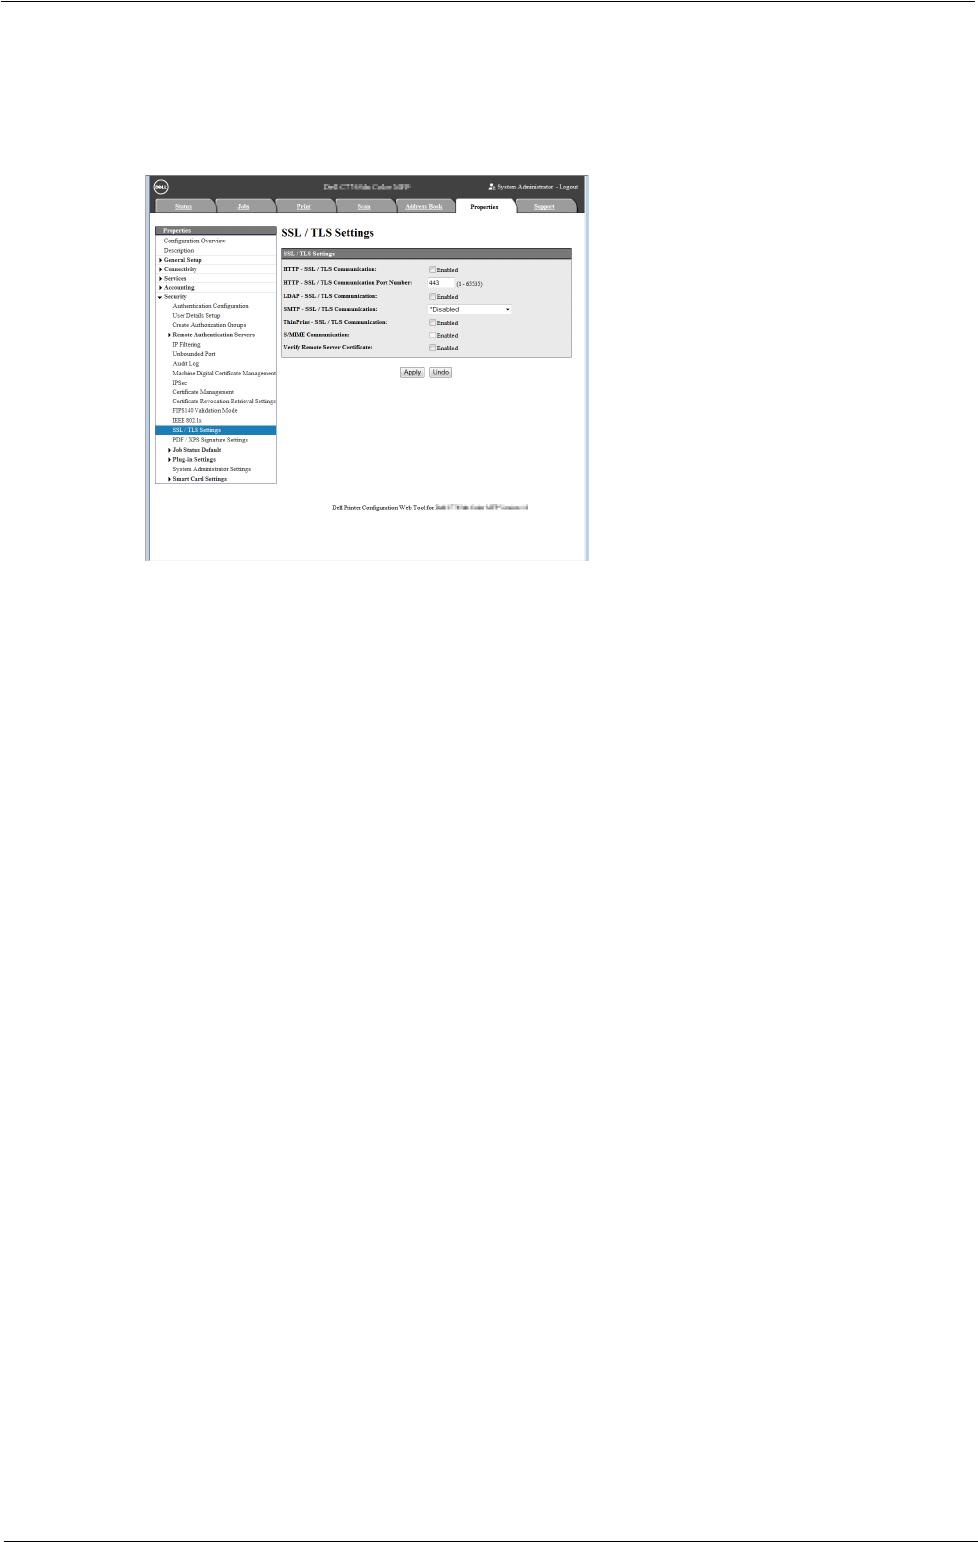 dell c5765dn default admin password